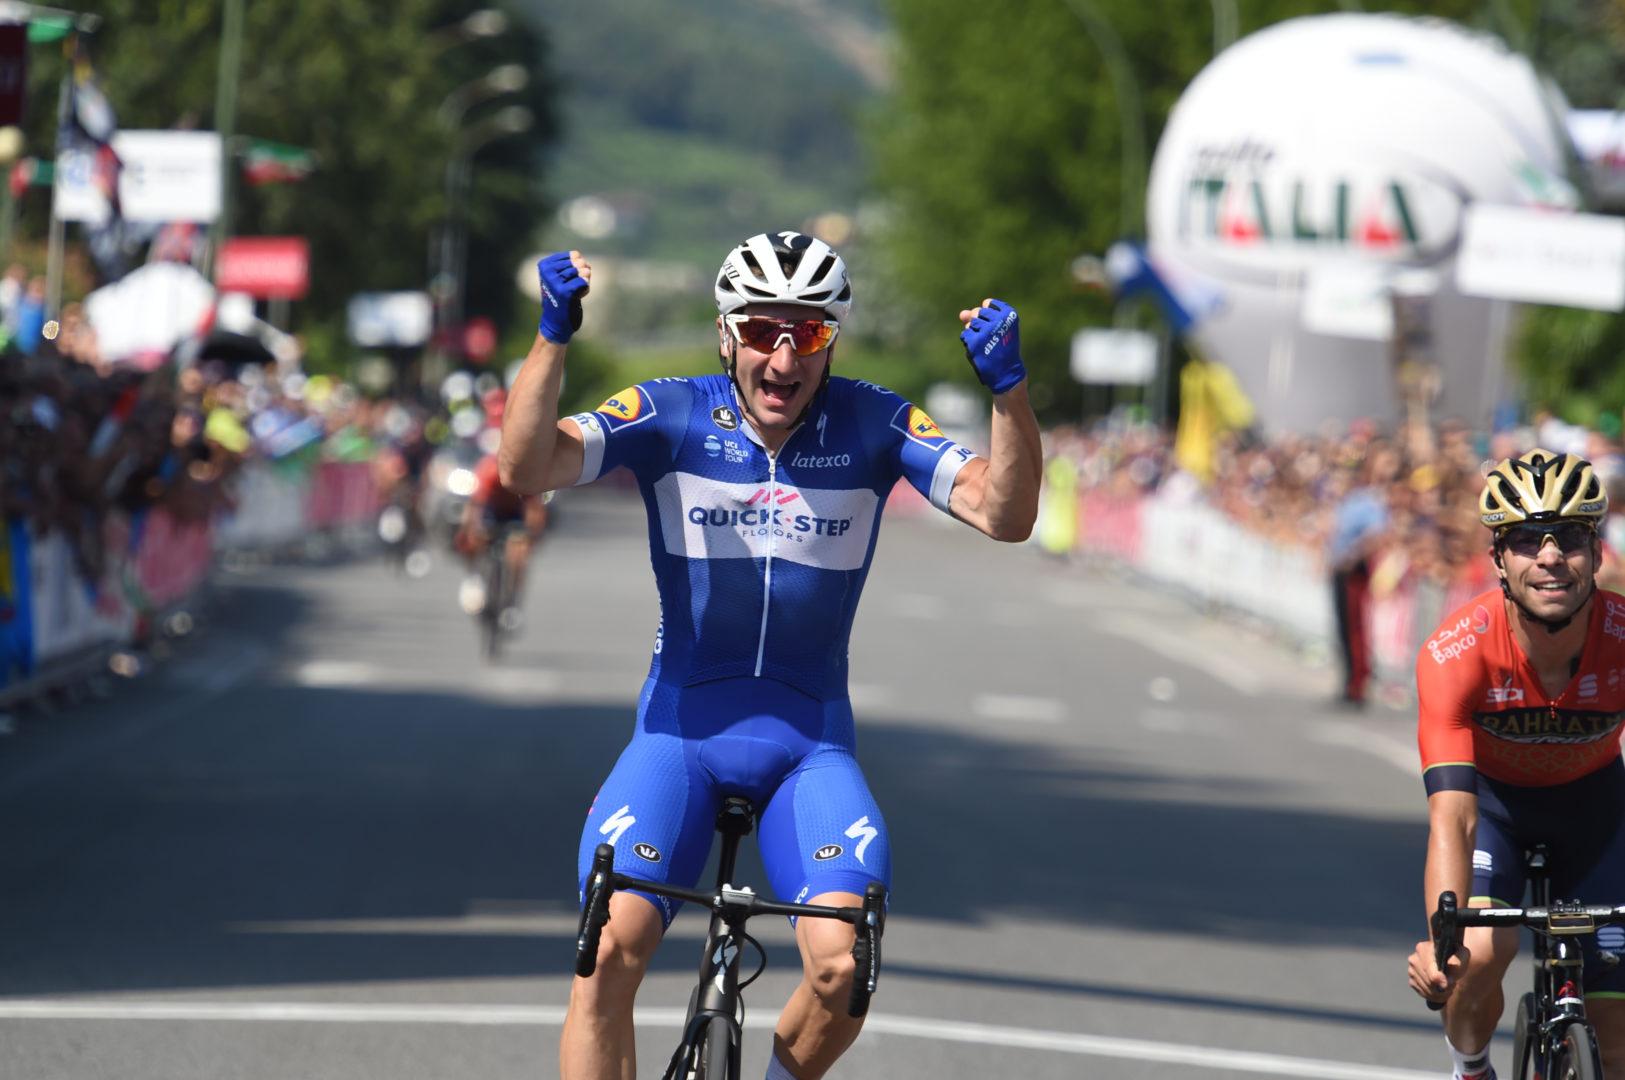 30-06-2018 Campionato Italiano; 2018, Quick Step - Floors; Viviani, Elia; Darfo Boario Terme;